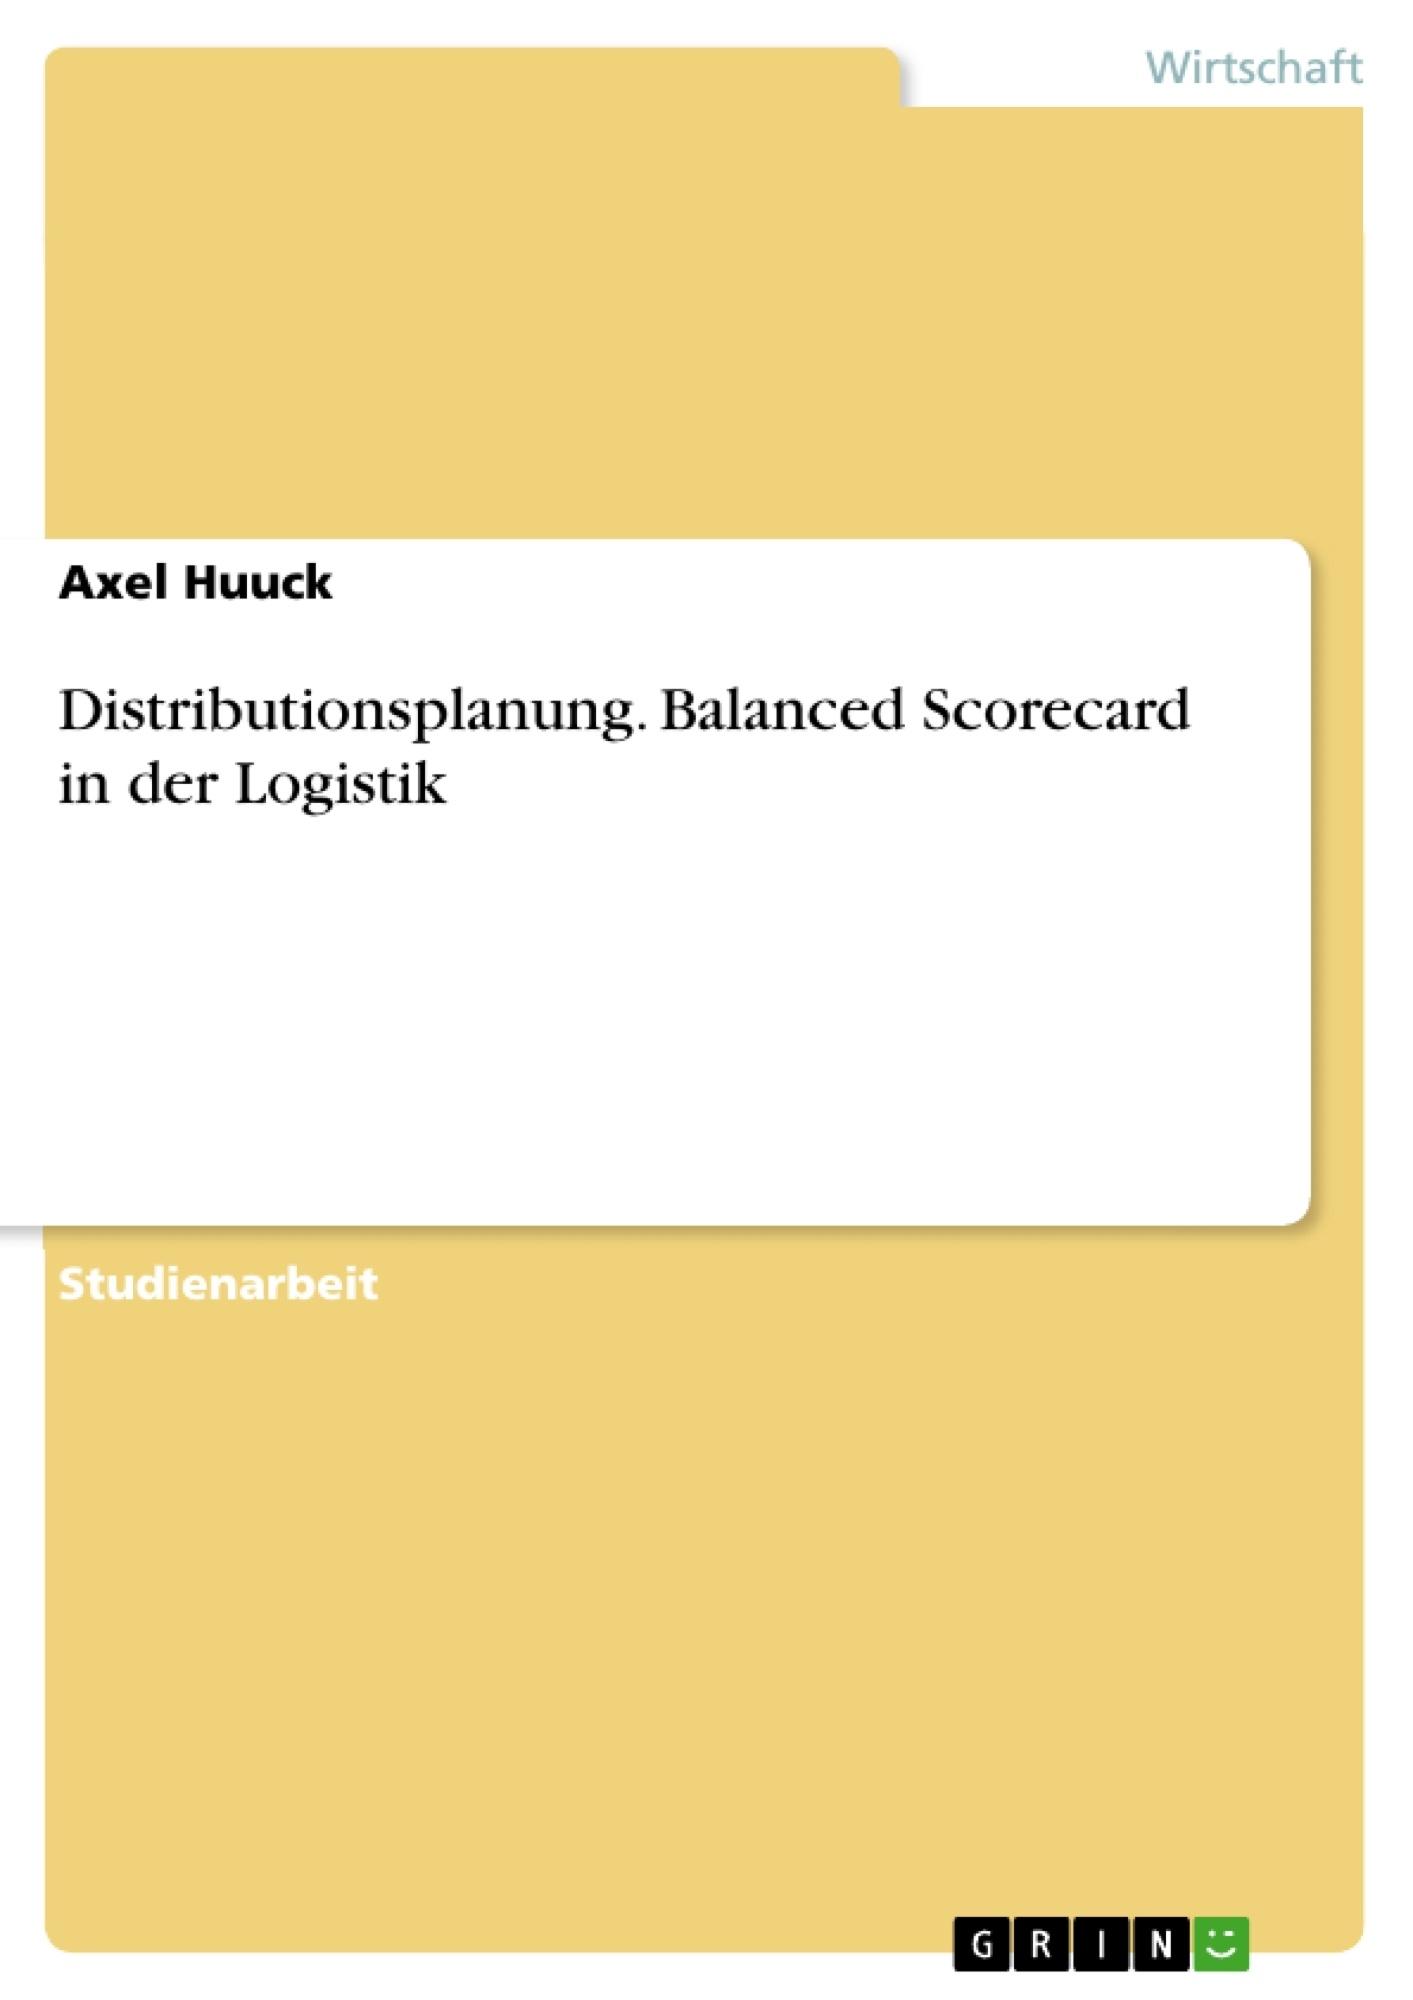 Titel: Distributionsplanung. Balanced Scorecard in der Logistik